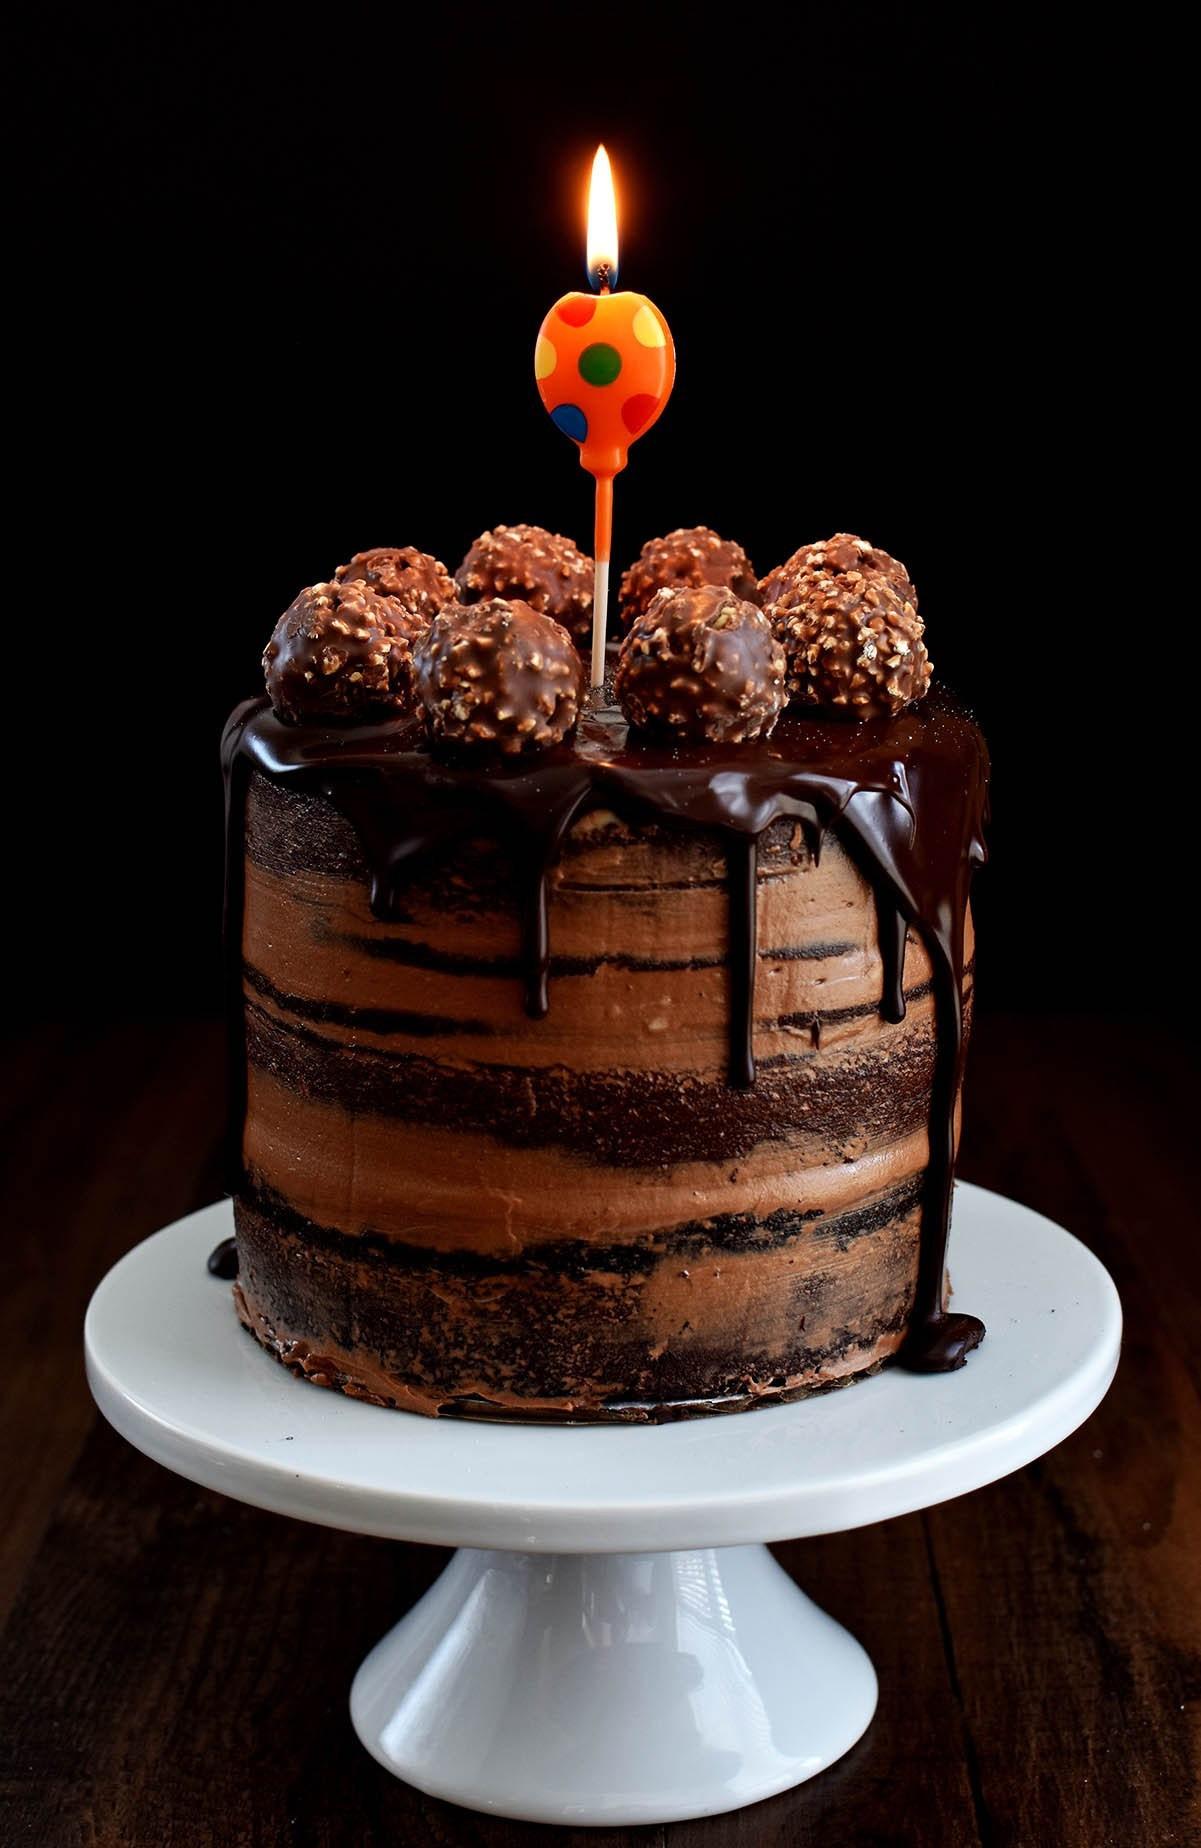 Best ideas about Chocolate Birthday Cake Recipes . Save or Pin Chocolate Hazelnut Semi Naked Cake with Dark Chocolate Now.